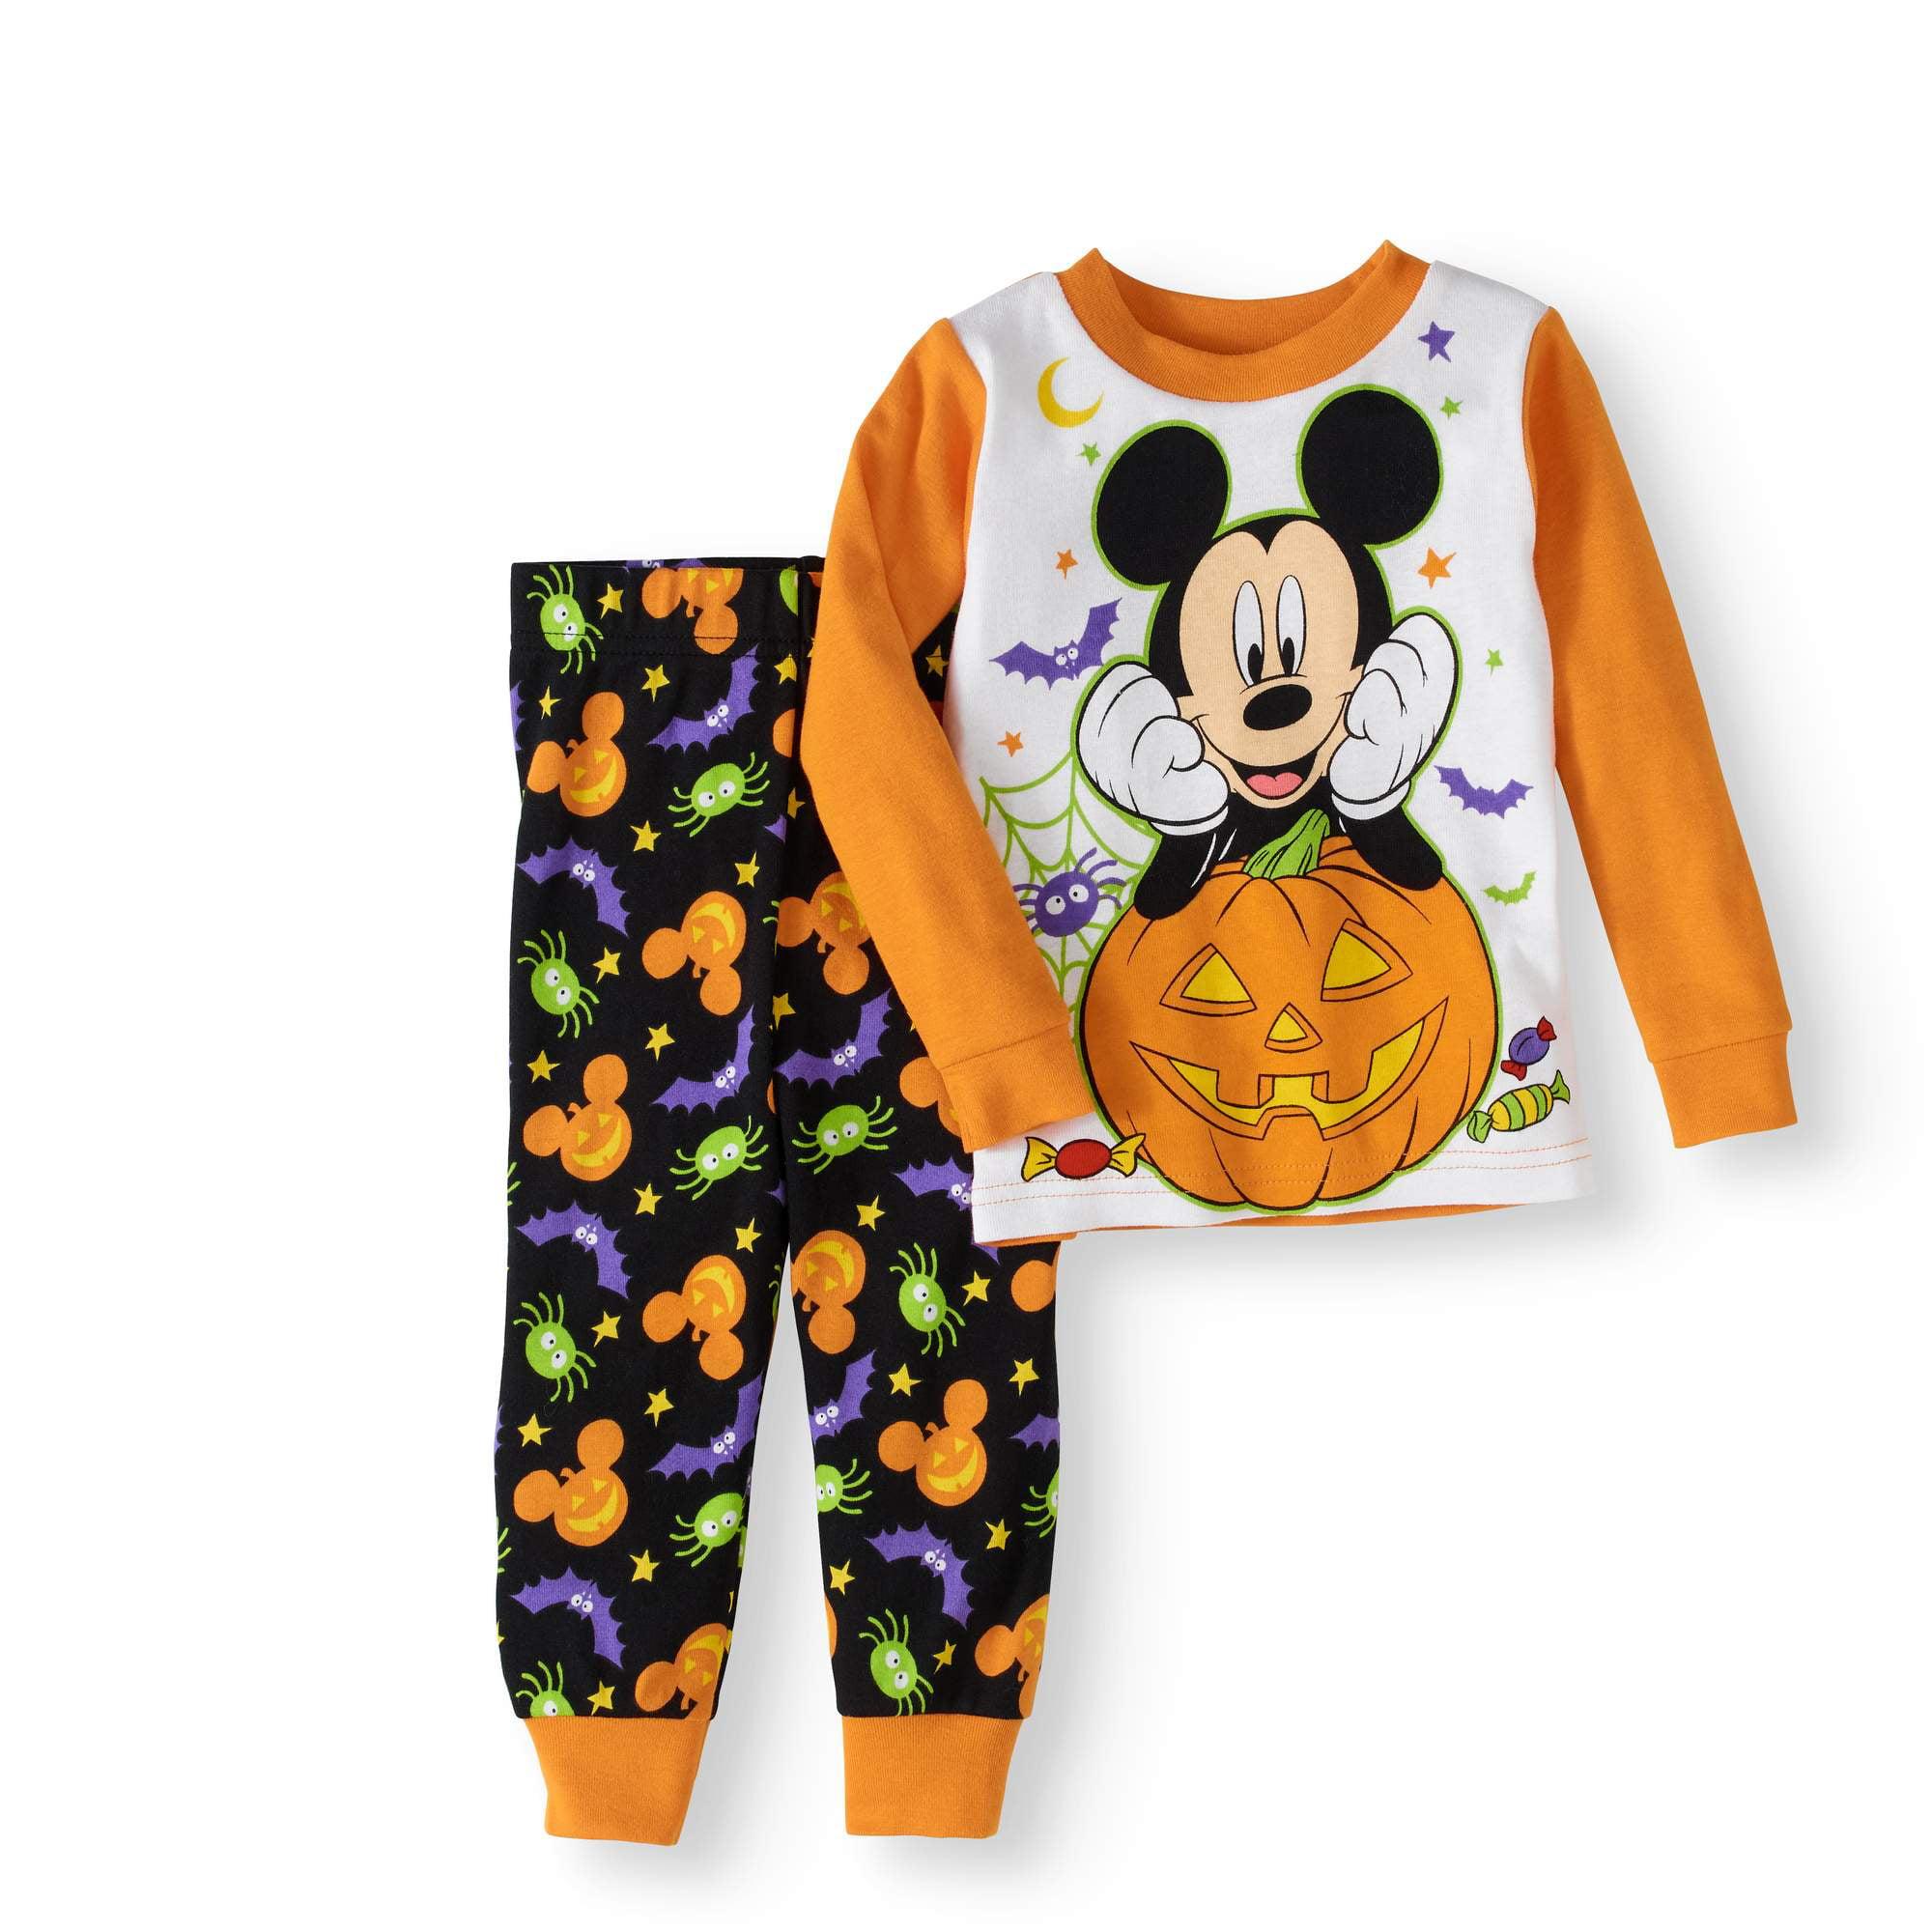 Halloween Newborn Baby Boy Cotton Tight Fit Pajamas 2pc Set